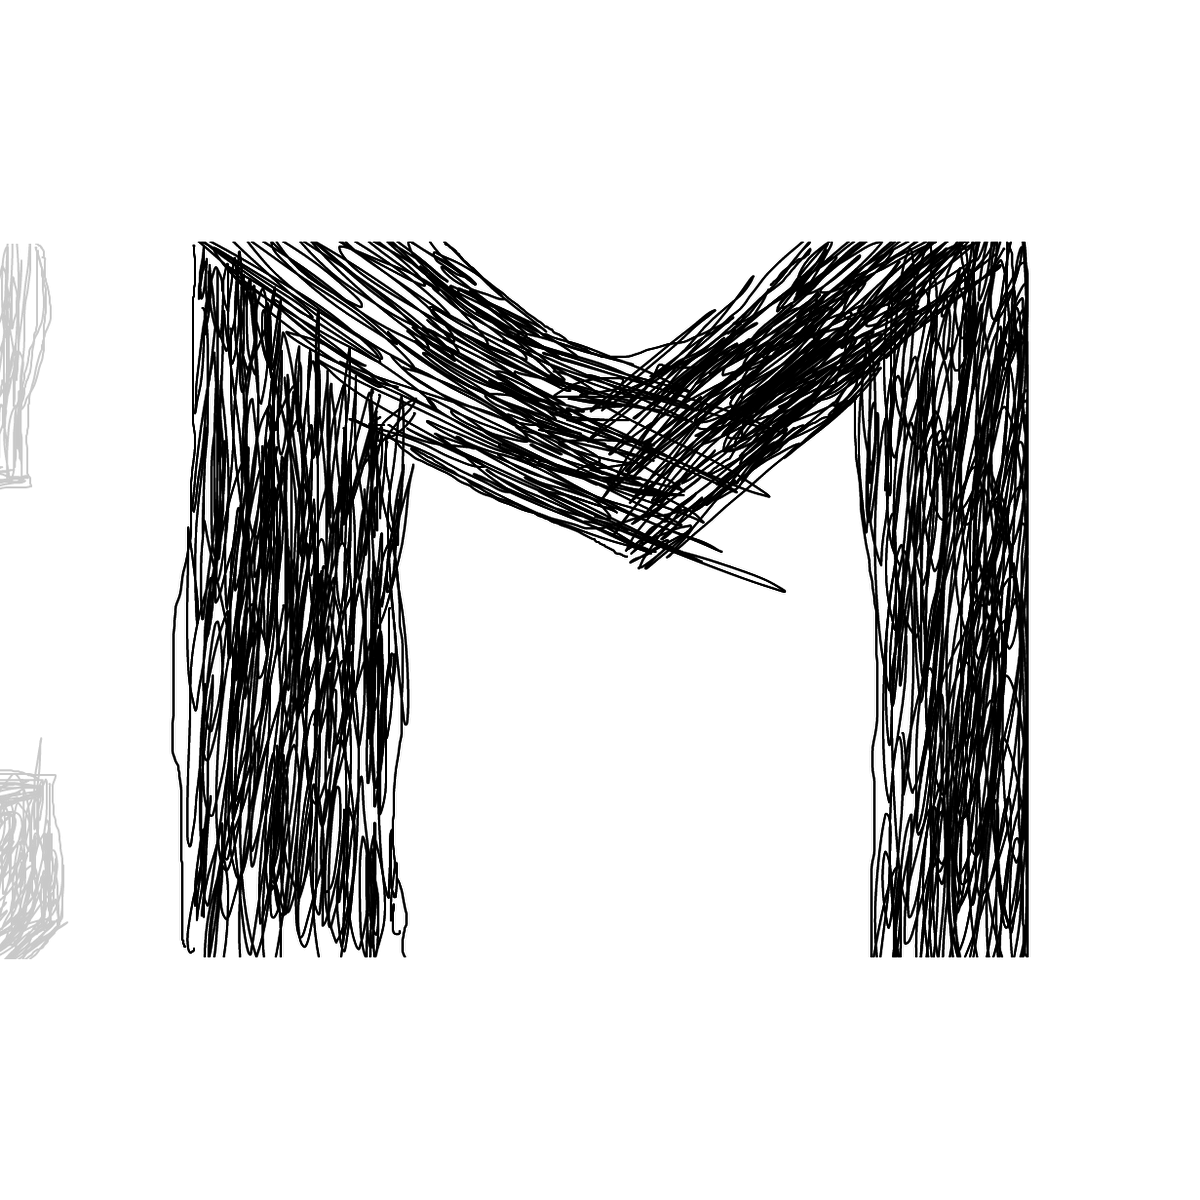 BAAAM drawing#8121 lat:52.0849456787109400lng: 5.1687240600585940